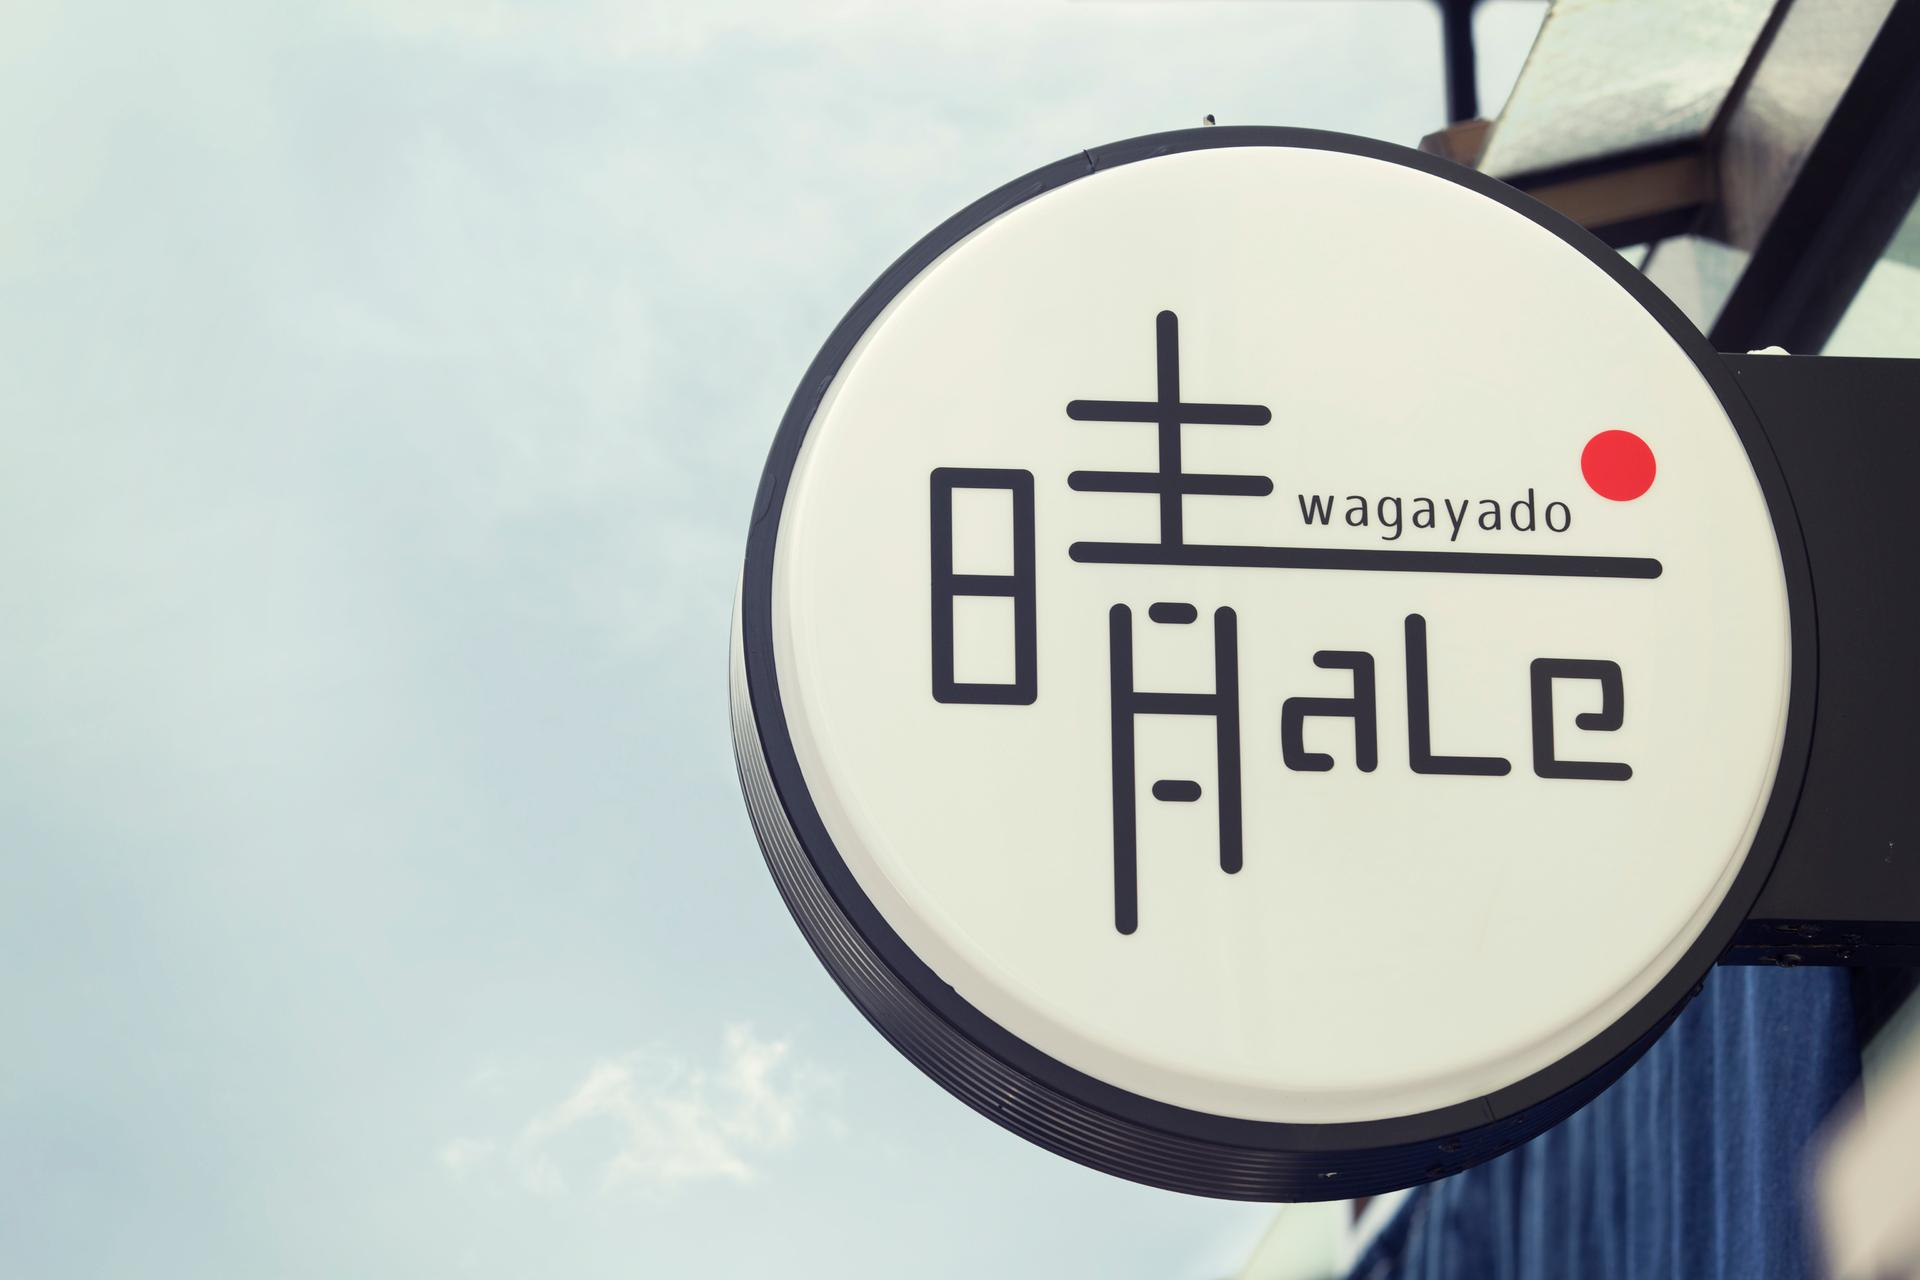 Guest House Wagayado  Hale